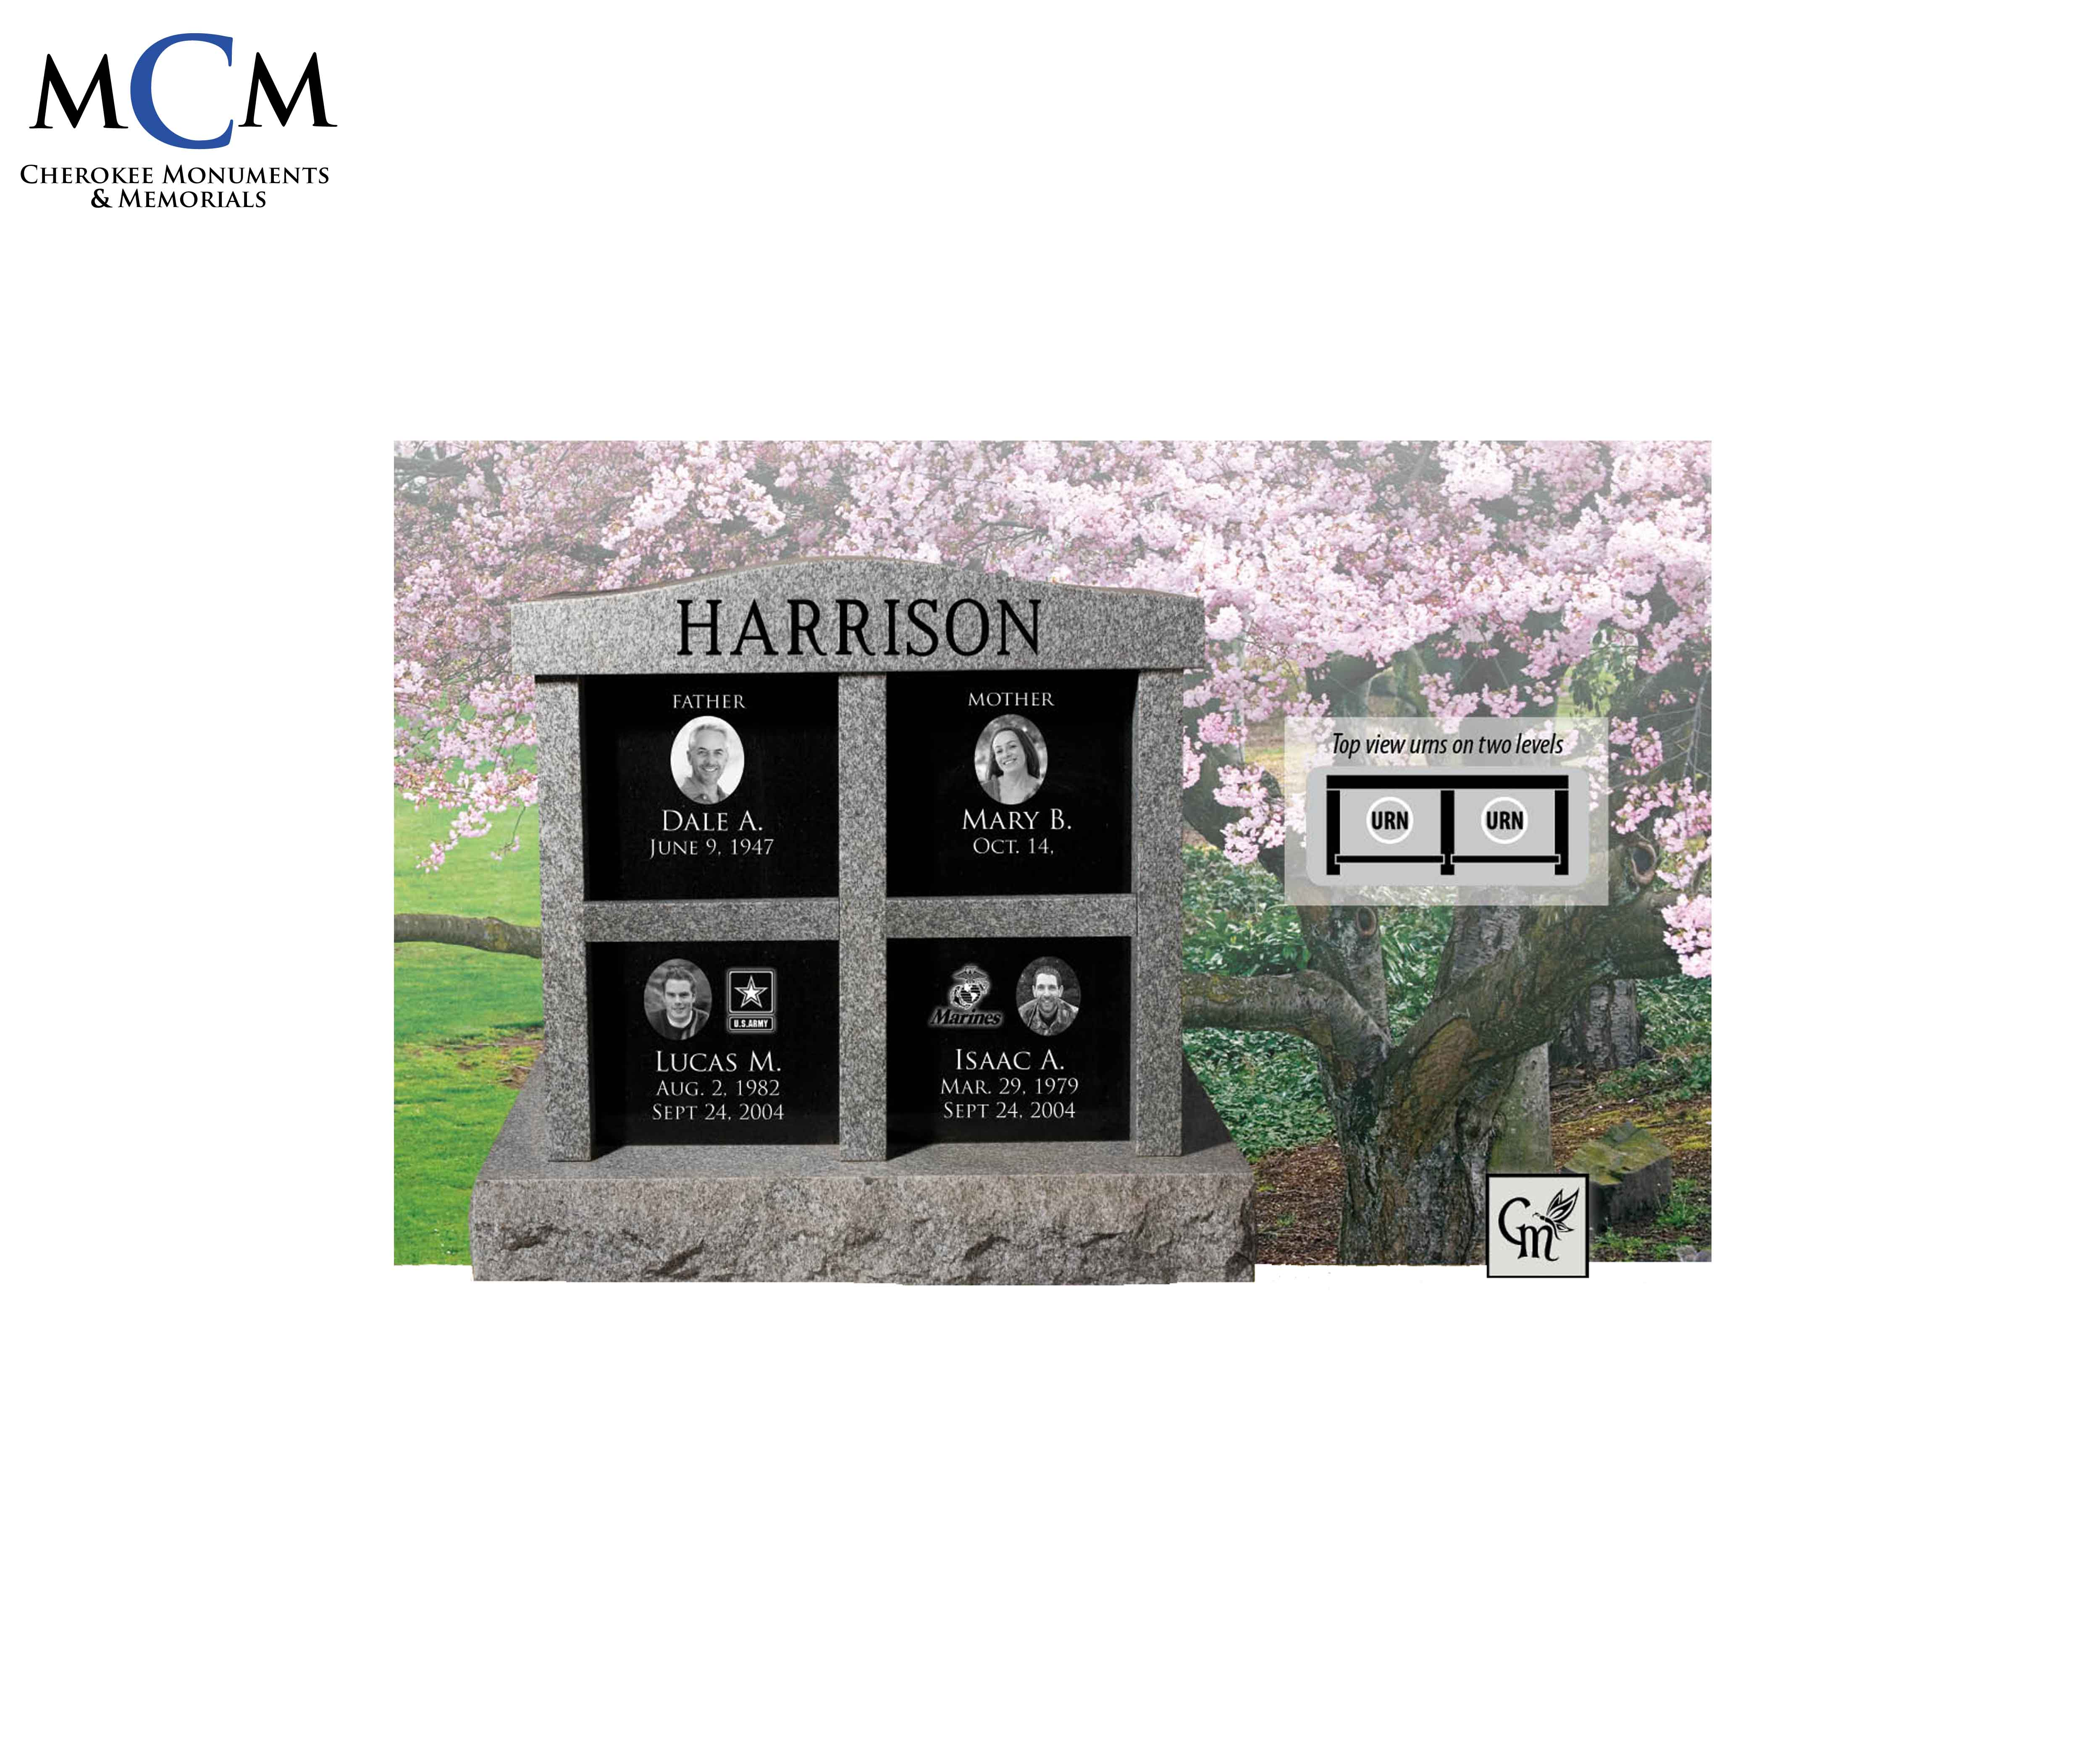 Upright Cremation Memorials - Cherokee Monuments & Memorials